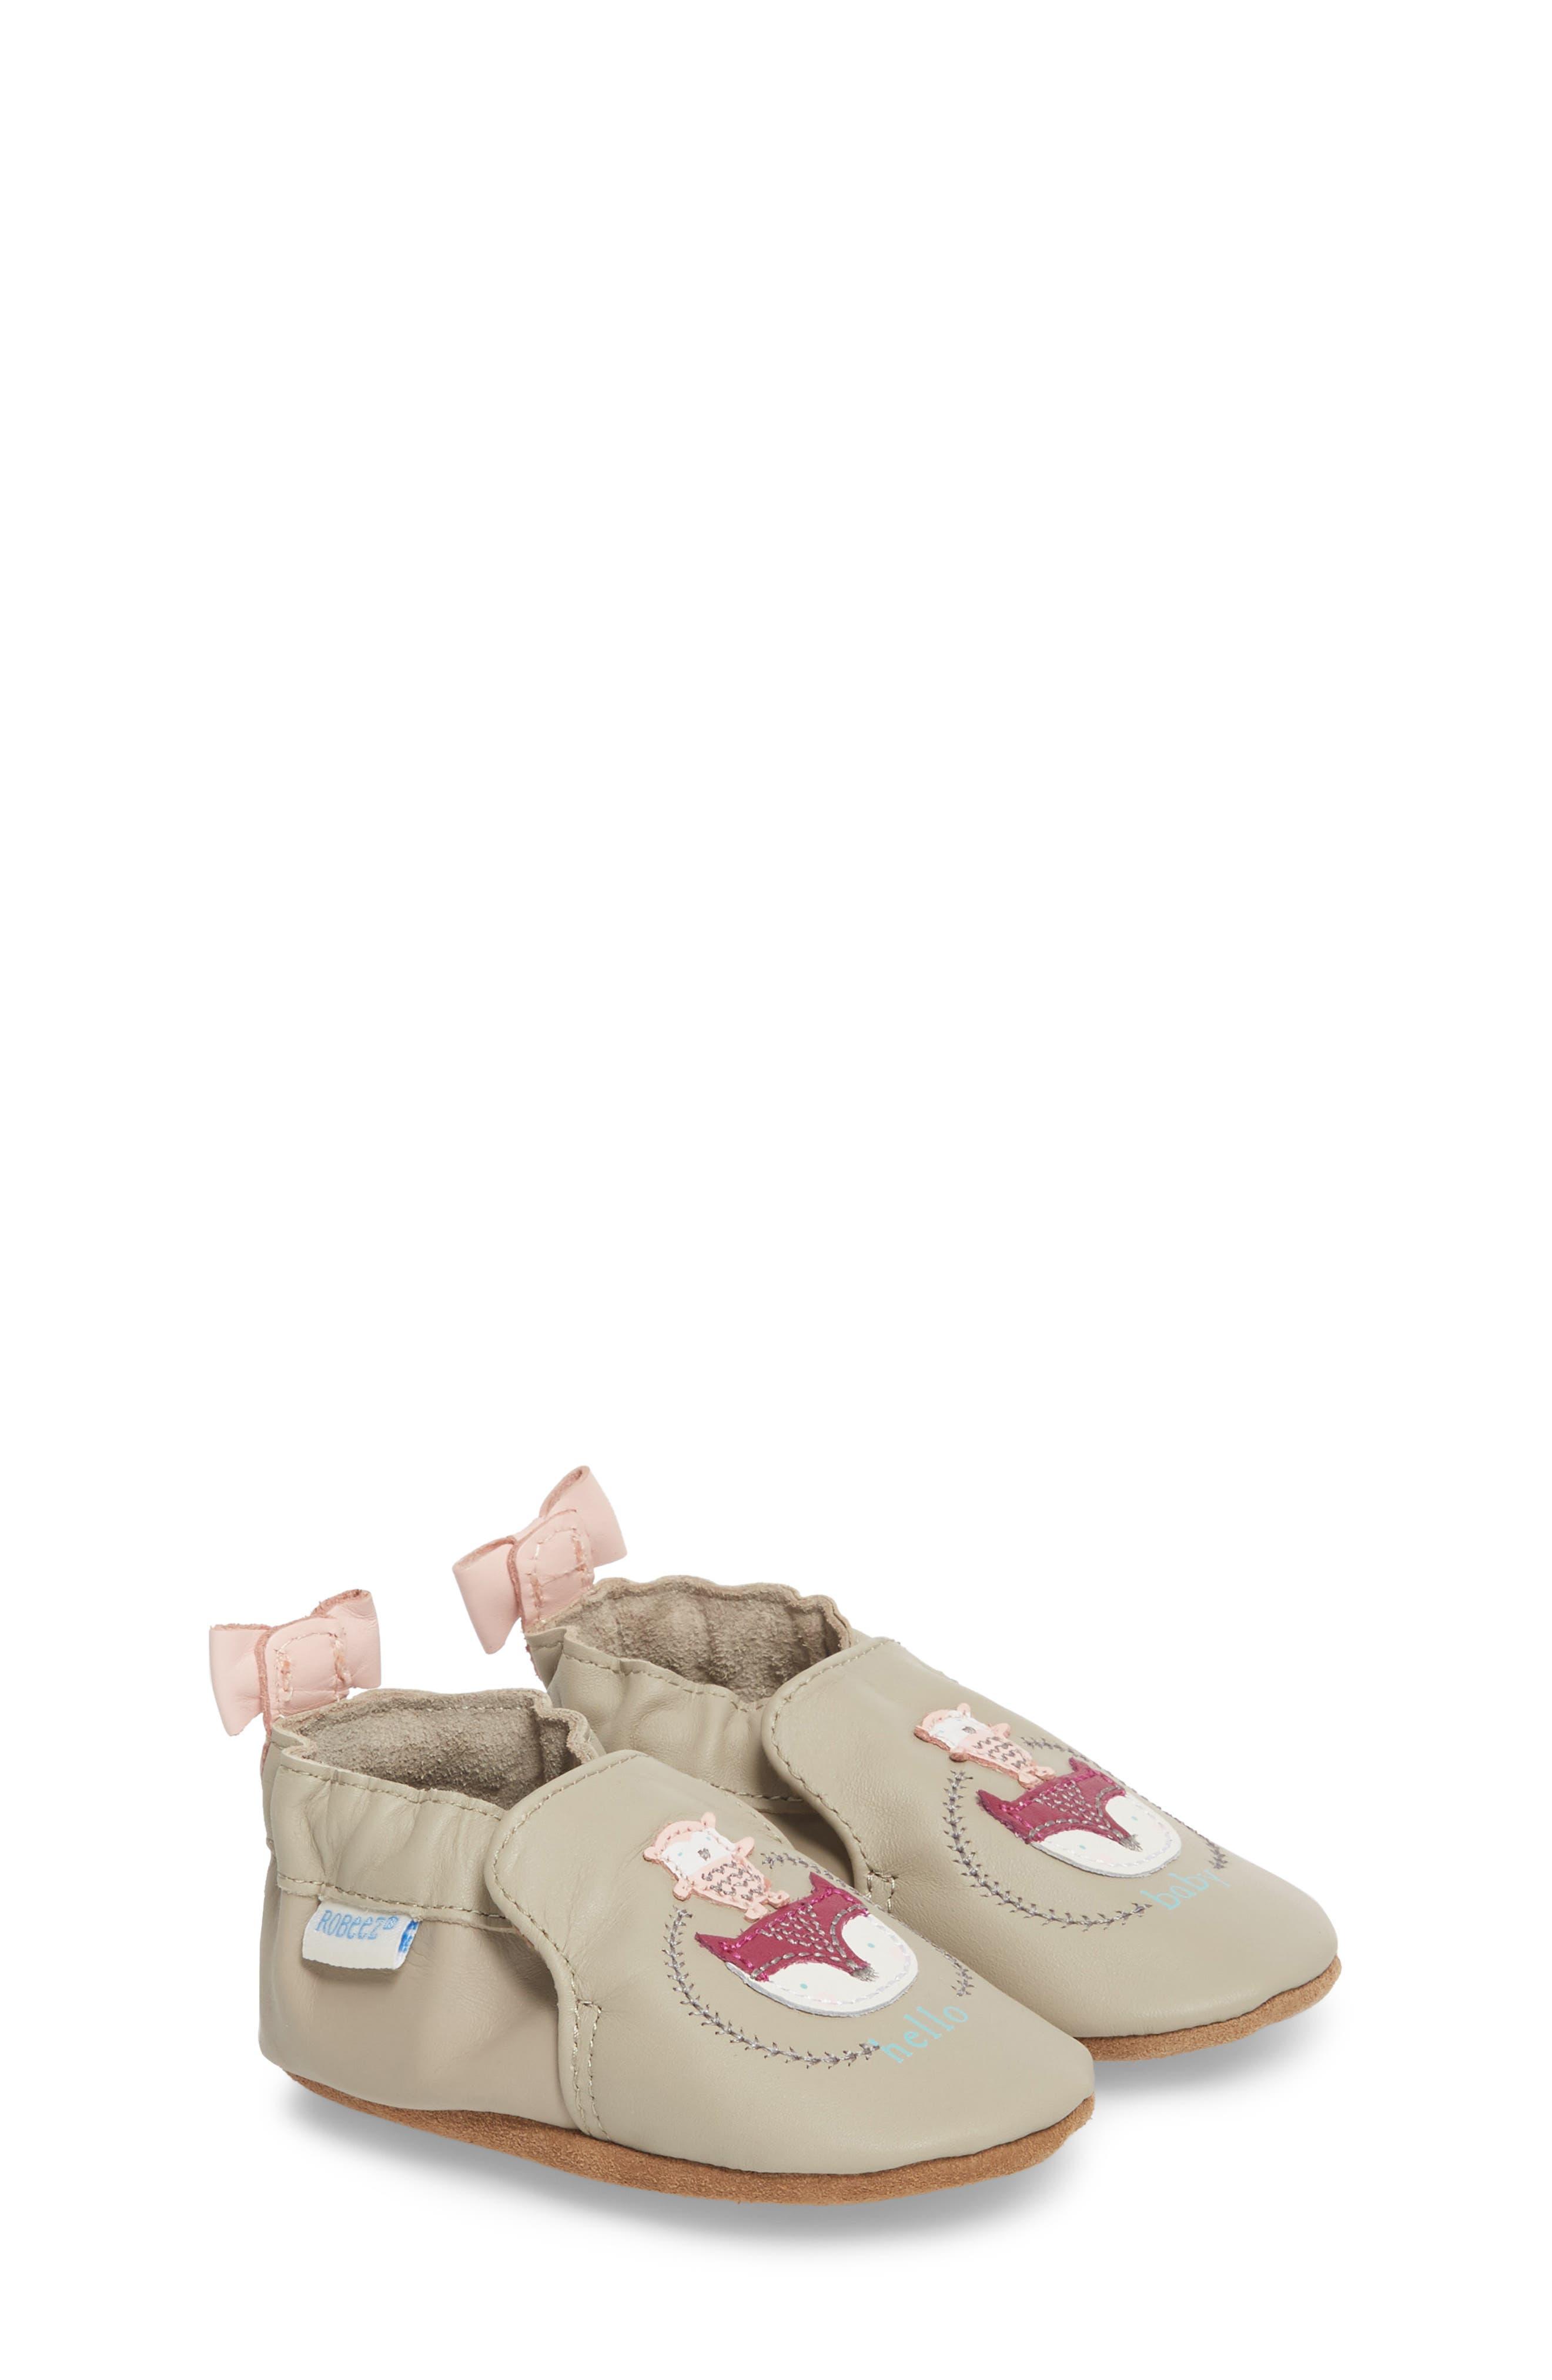 Hello Baby Friends Moccasin Crib Shoe,                             Main thumbnail 1, color,                             Light Grey